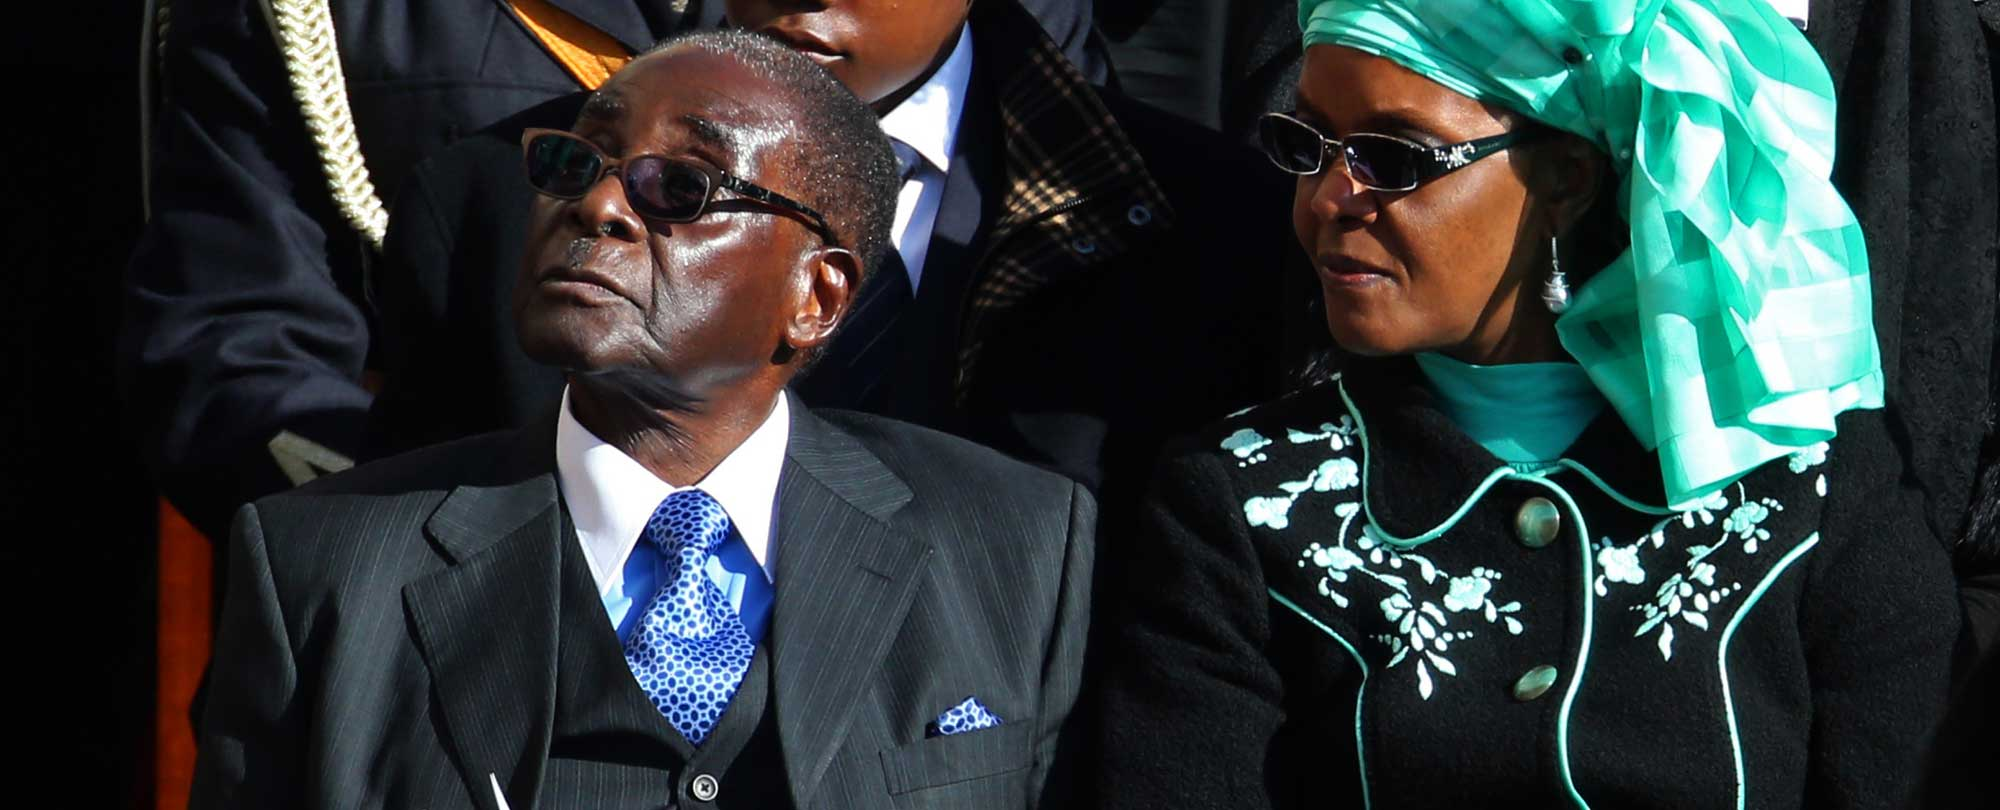 Grace Mugabe Feminist Icon Or Political Menace True Africa